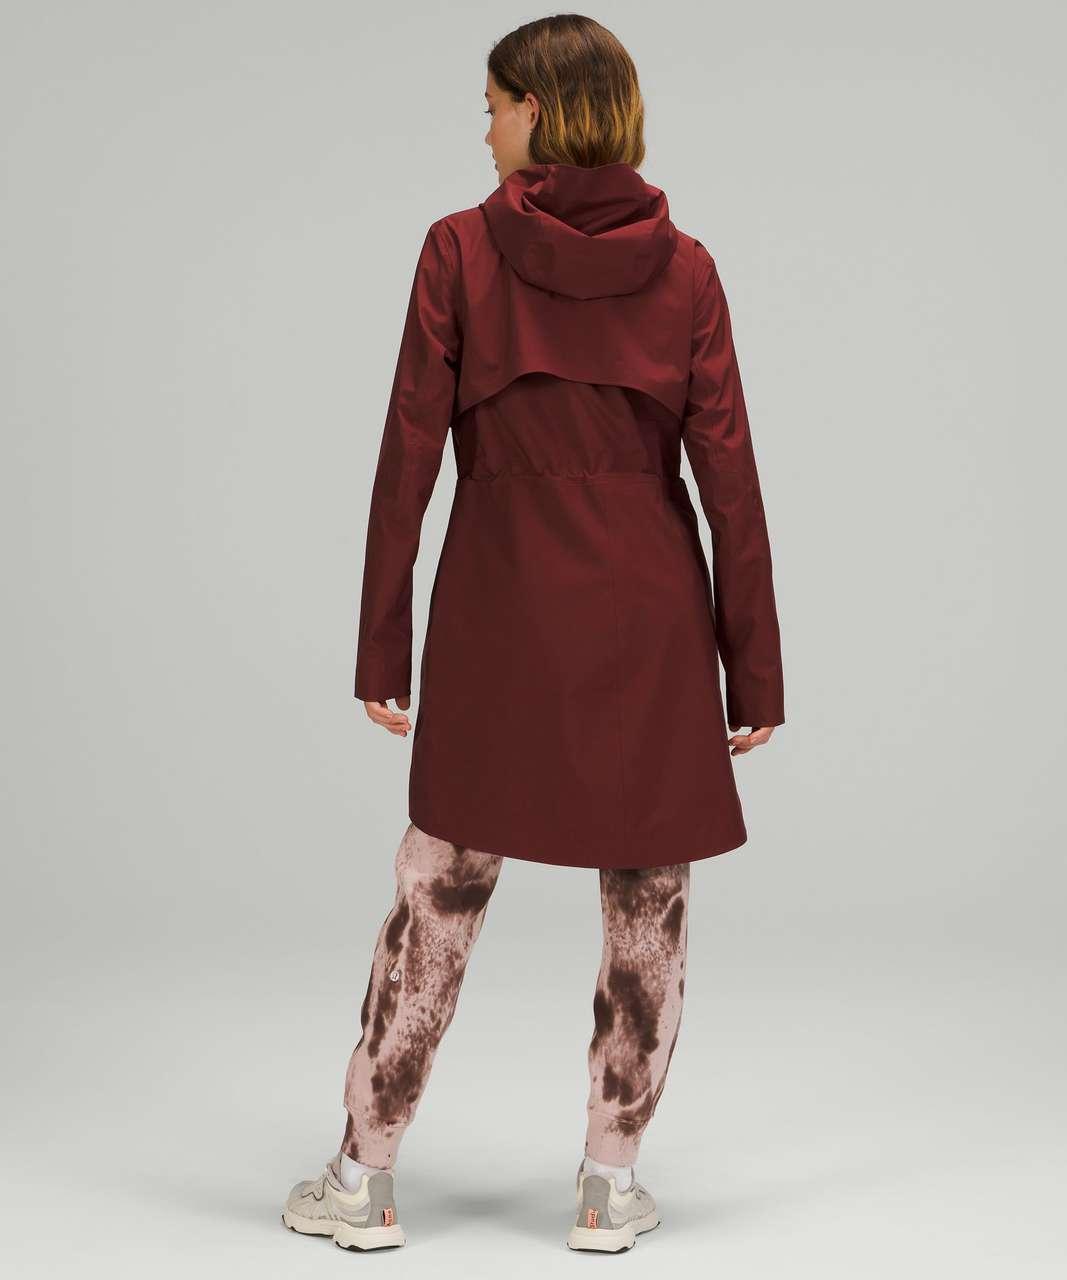 Lululemon Rain Rebel Jacket - Red Merlot